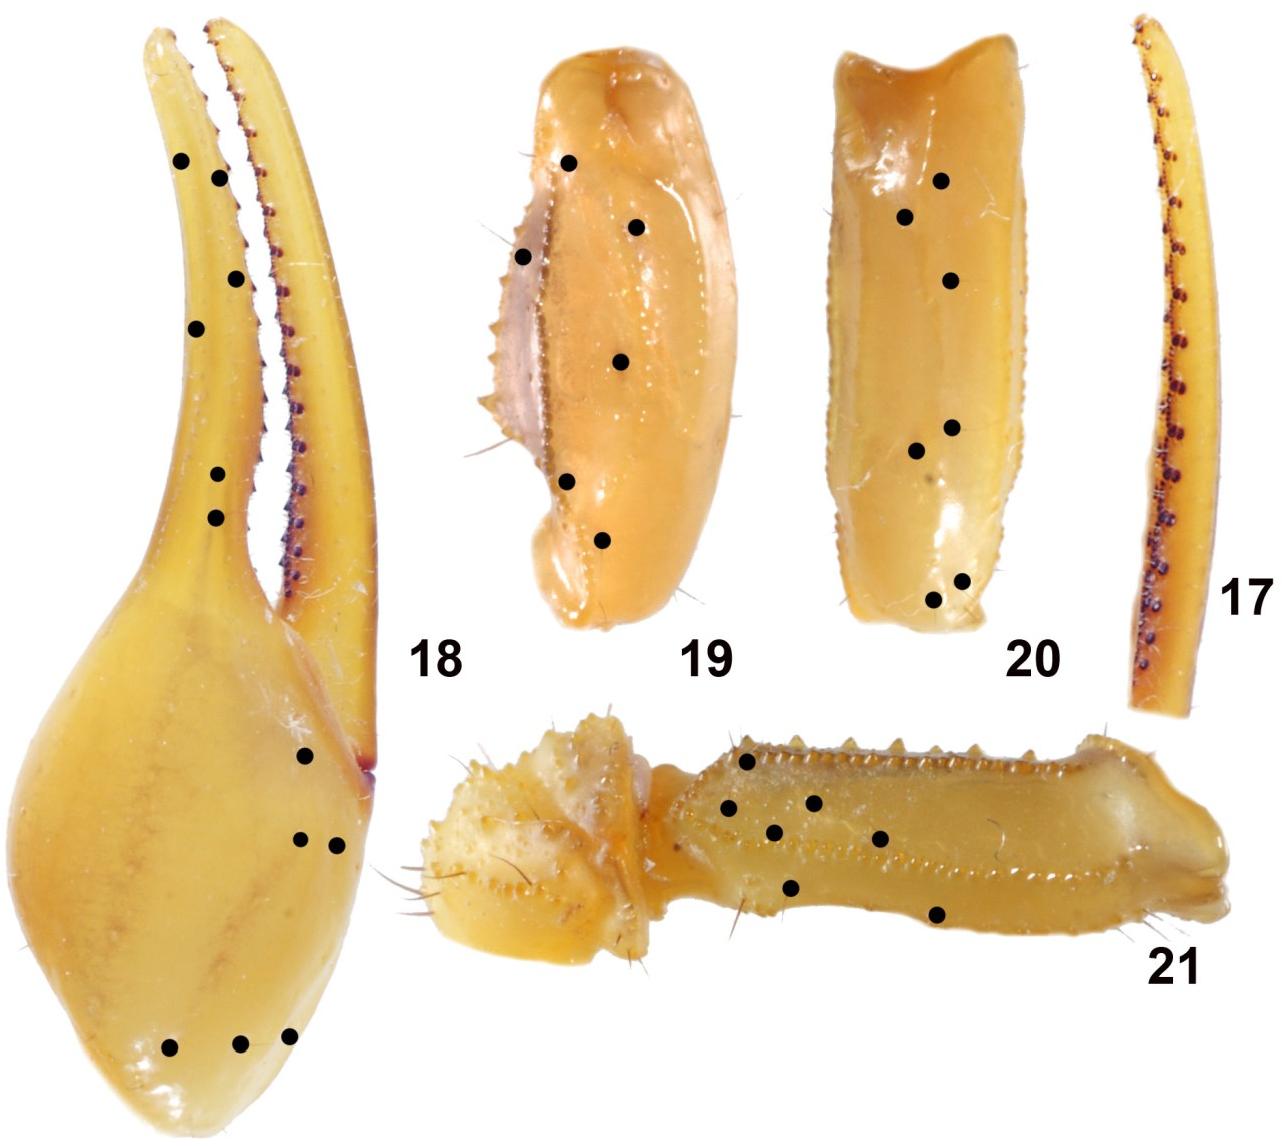 figure 17–21